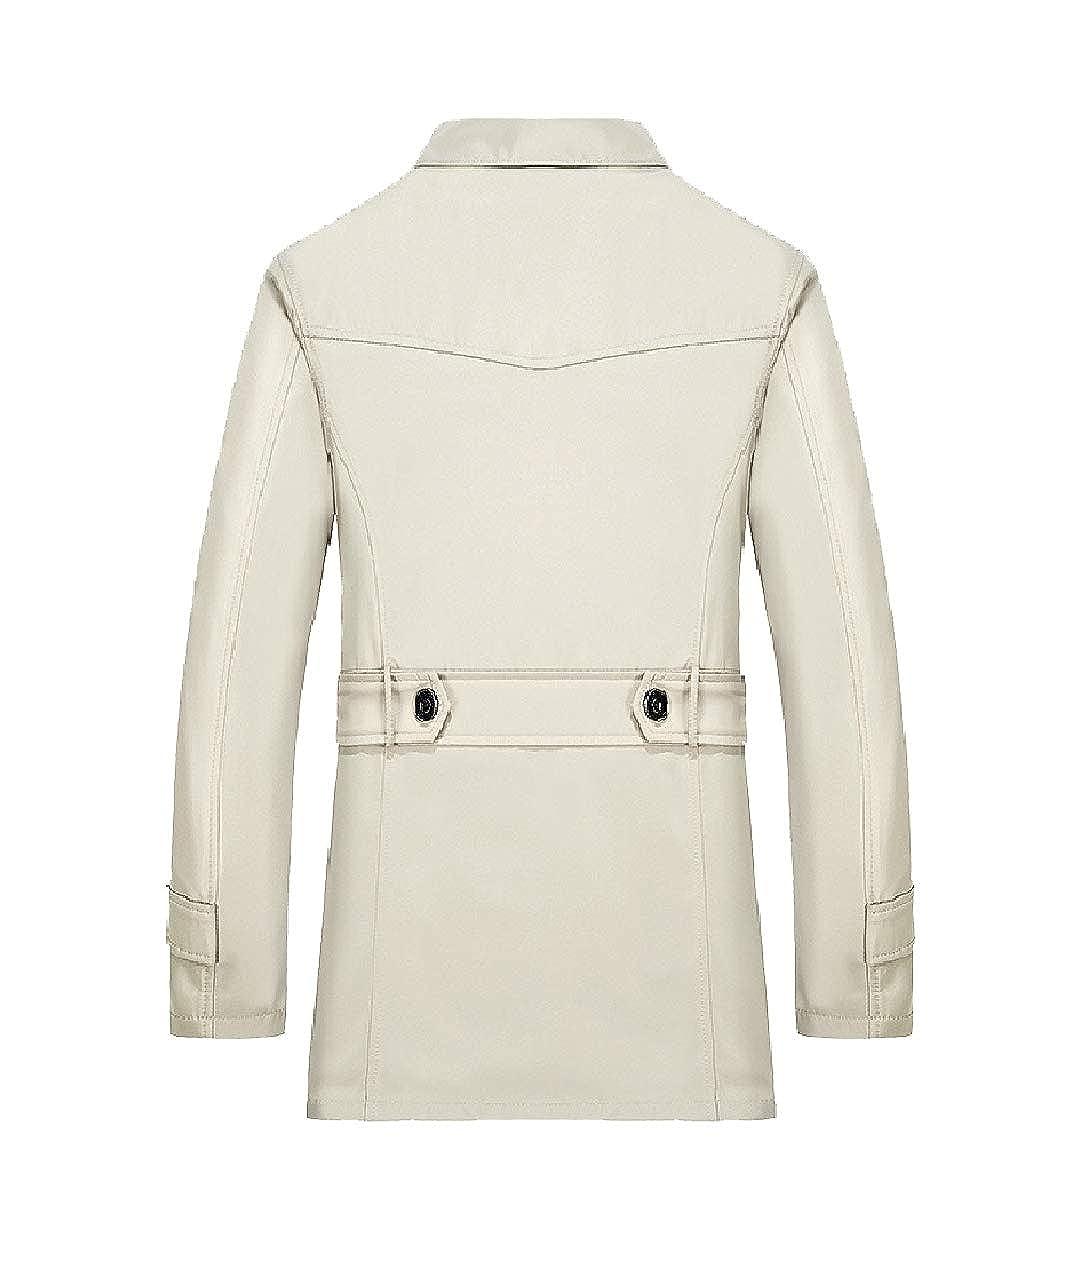 Zimaes-Men Trench Fleece Lined Winter Plus Size Parka Coats Jackets